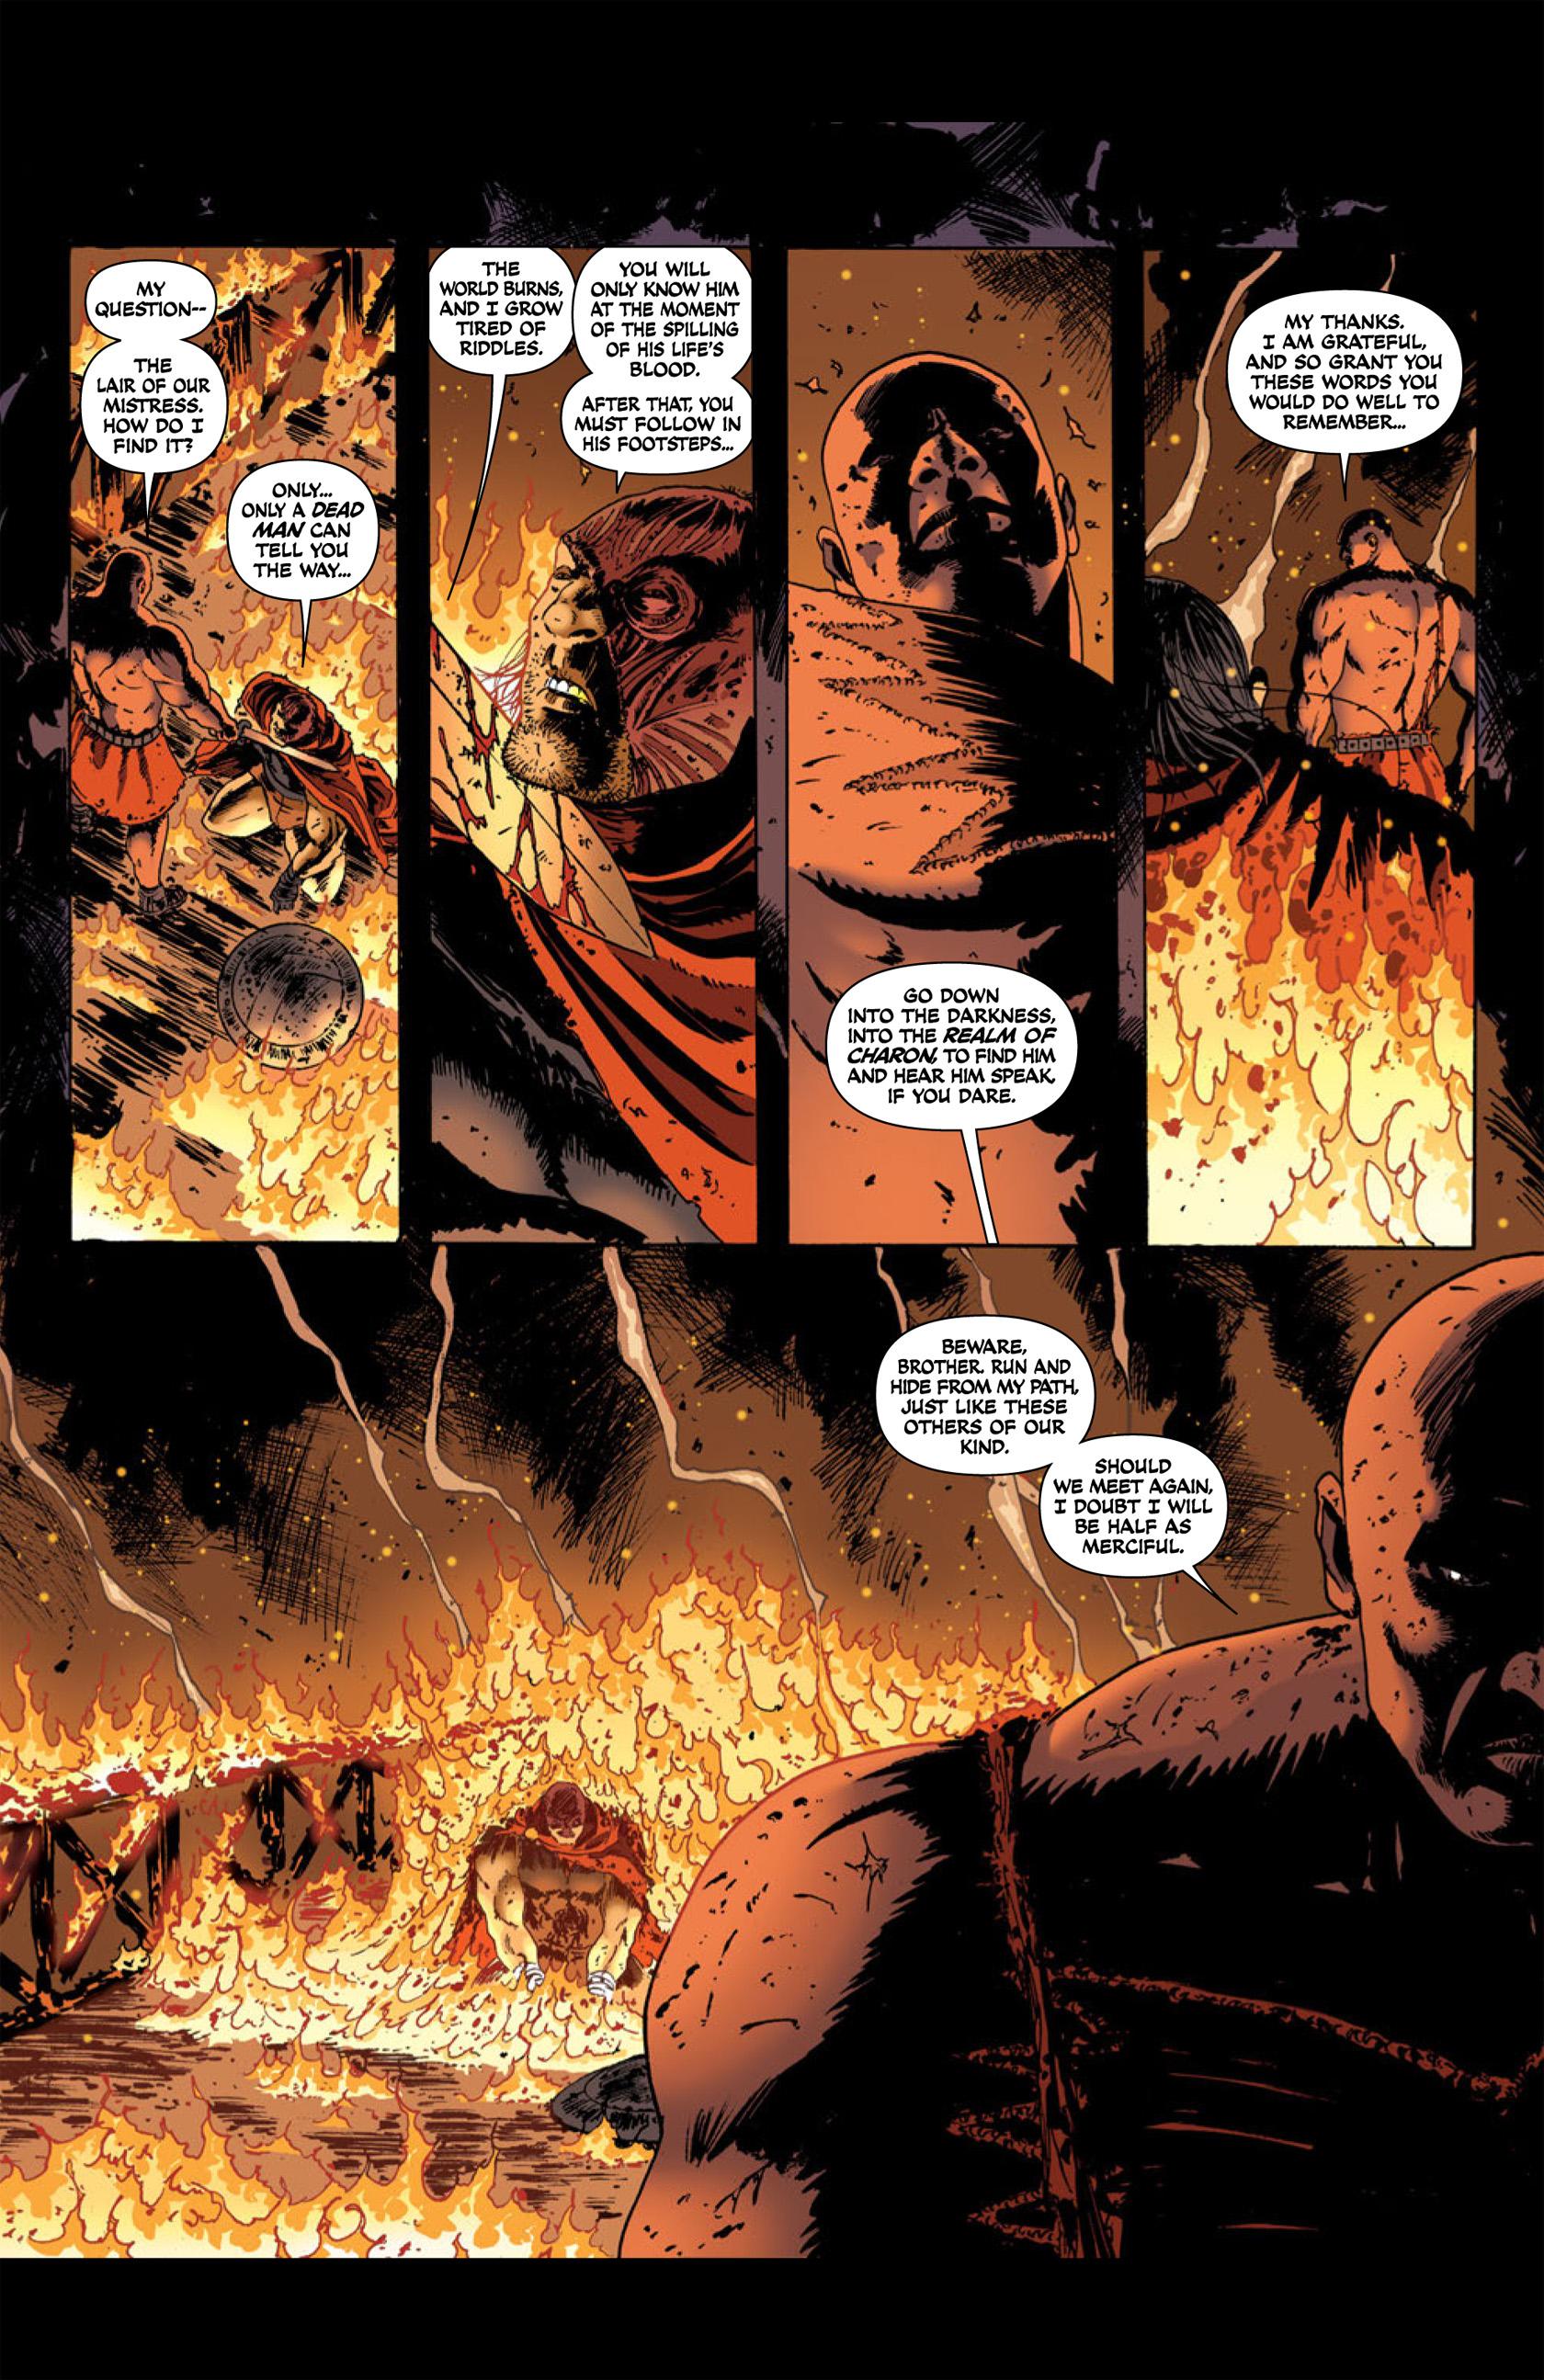 Read online Aquila comic -  Issue #2 - 17